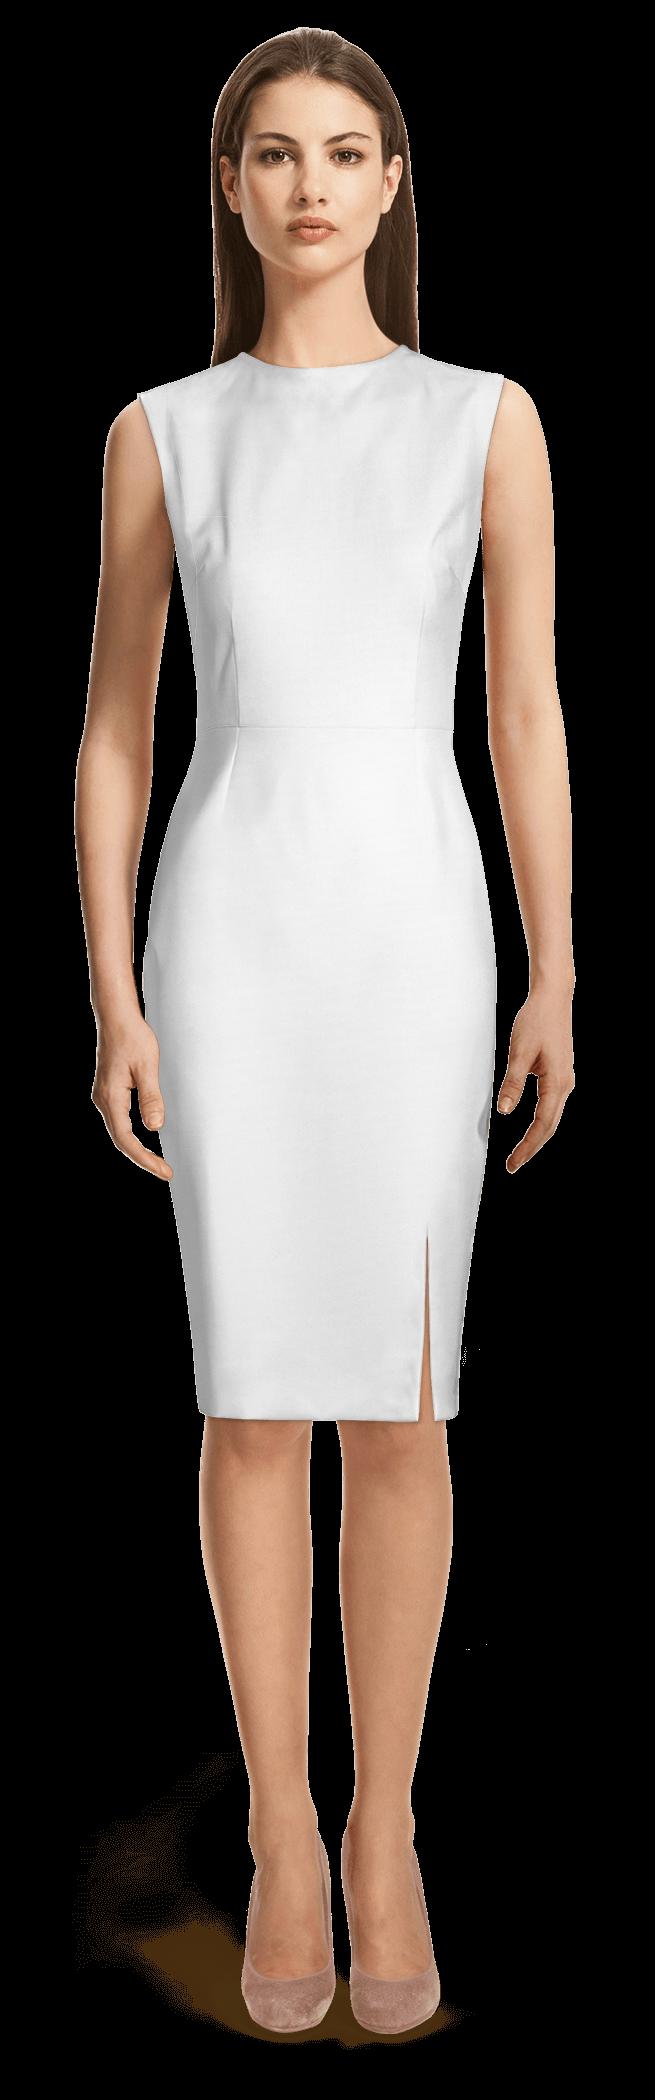 Custom Tailored Dresses